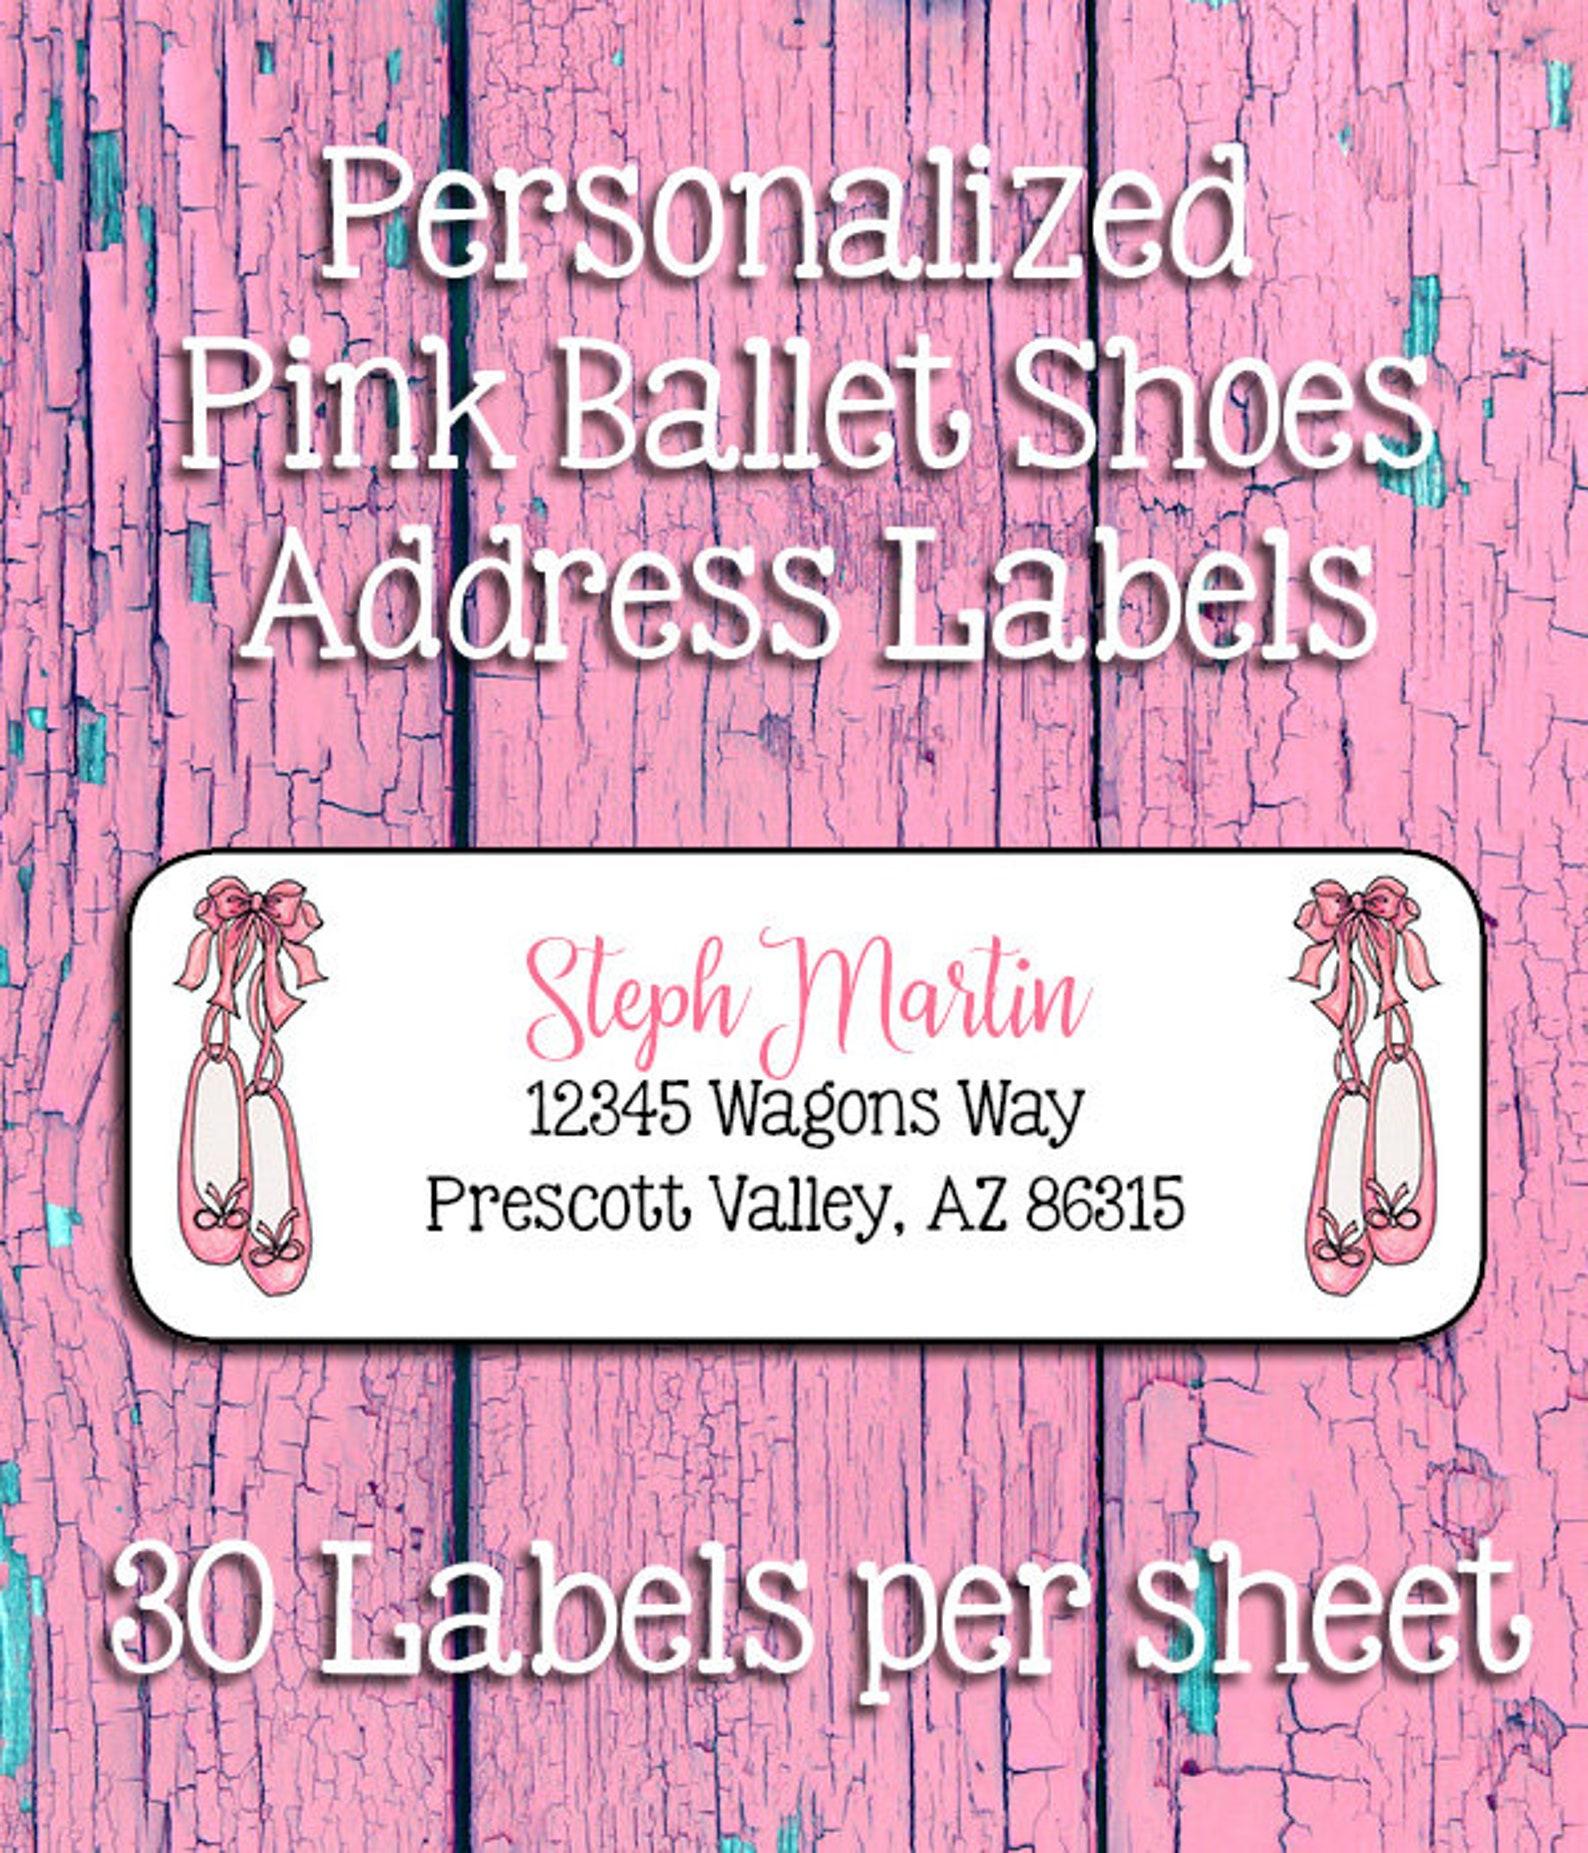 pink ballet shoes personalized address labels, return address labels, sets of 30, toe shoes